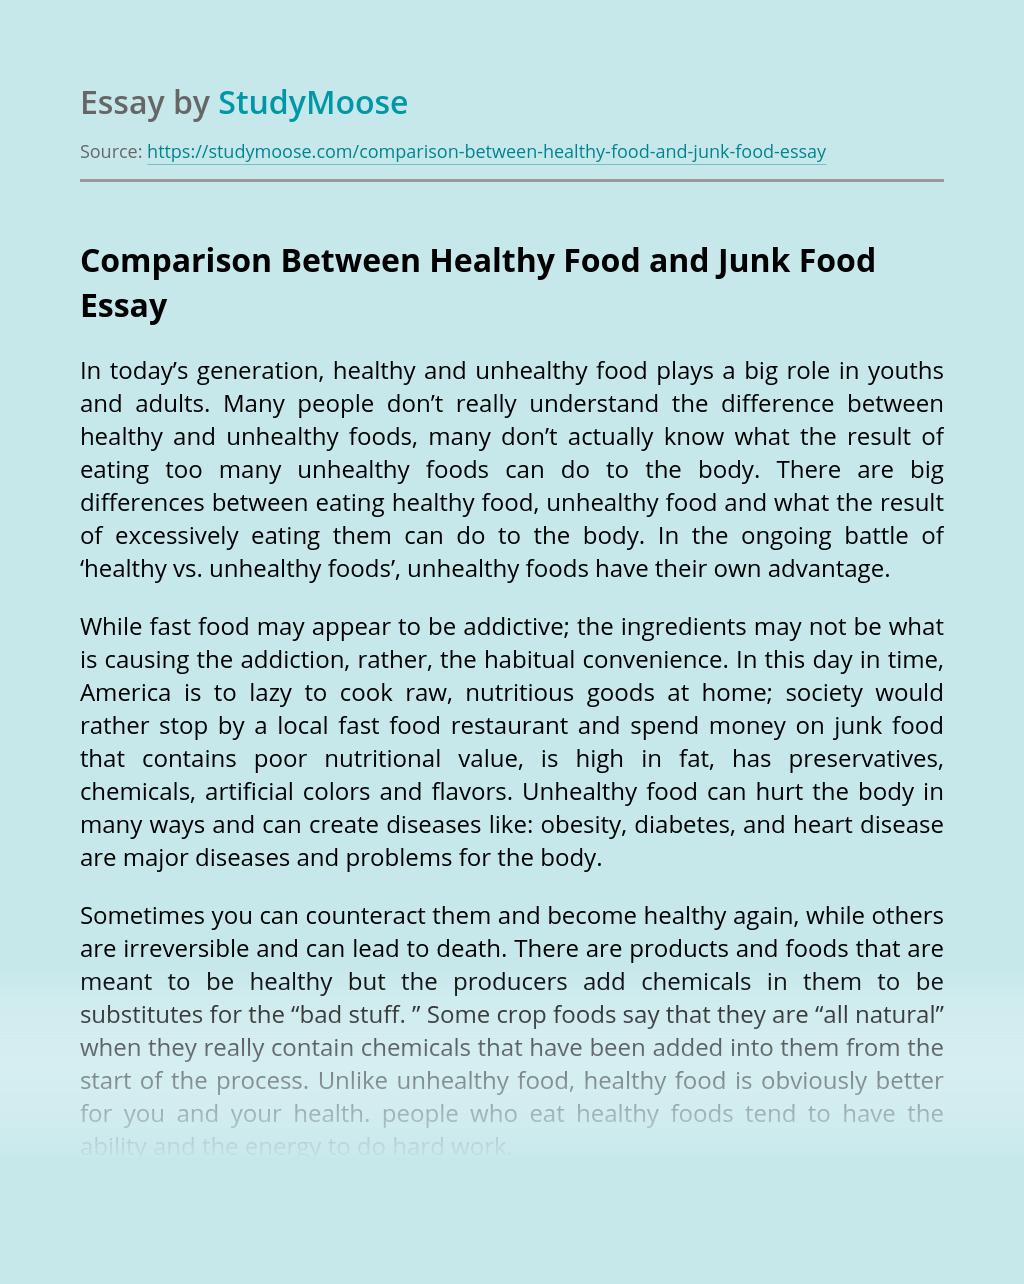 Comparison Between Healthy Food and Junk Food